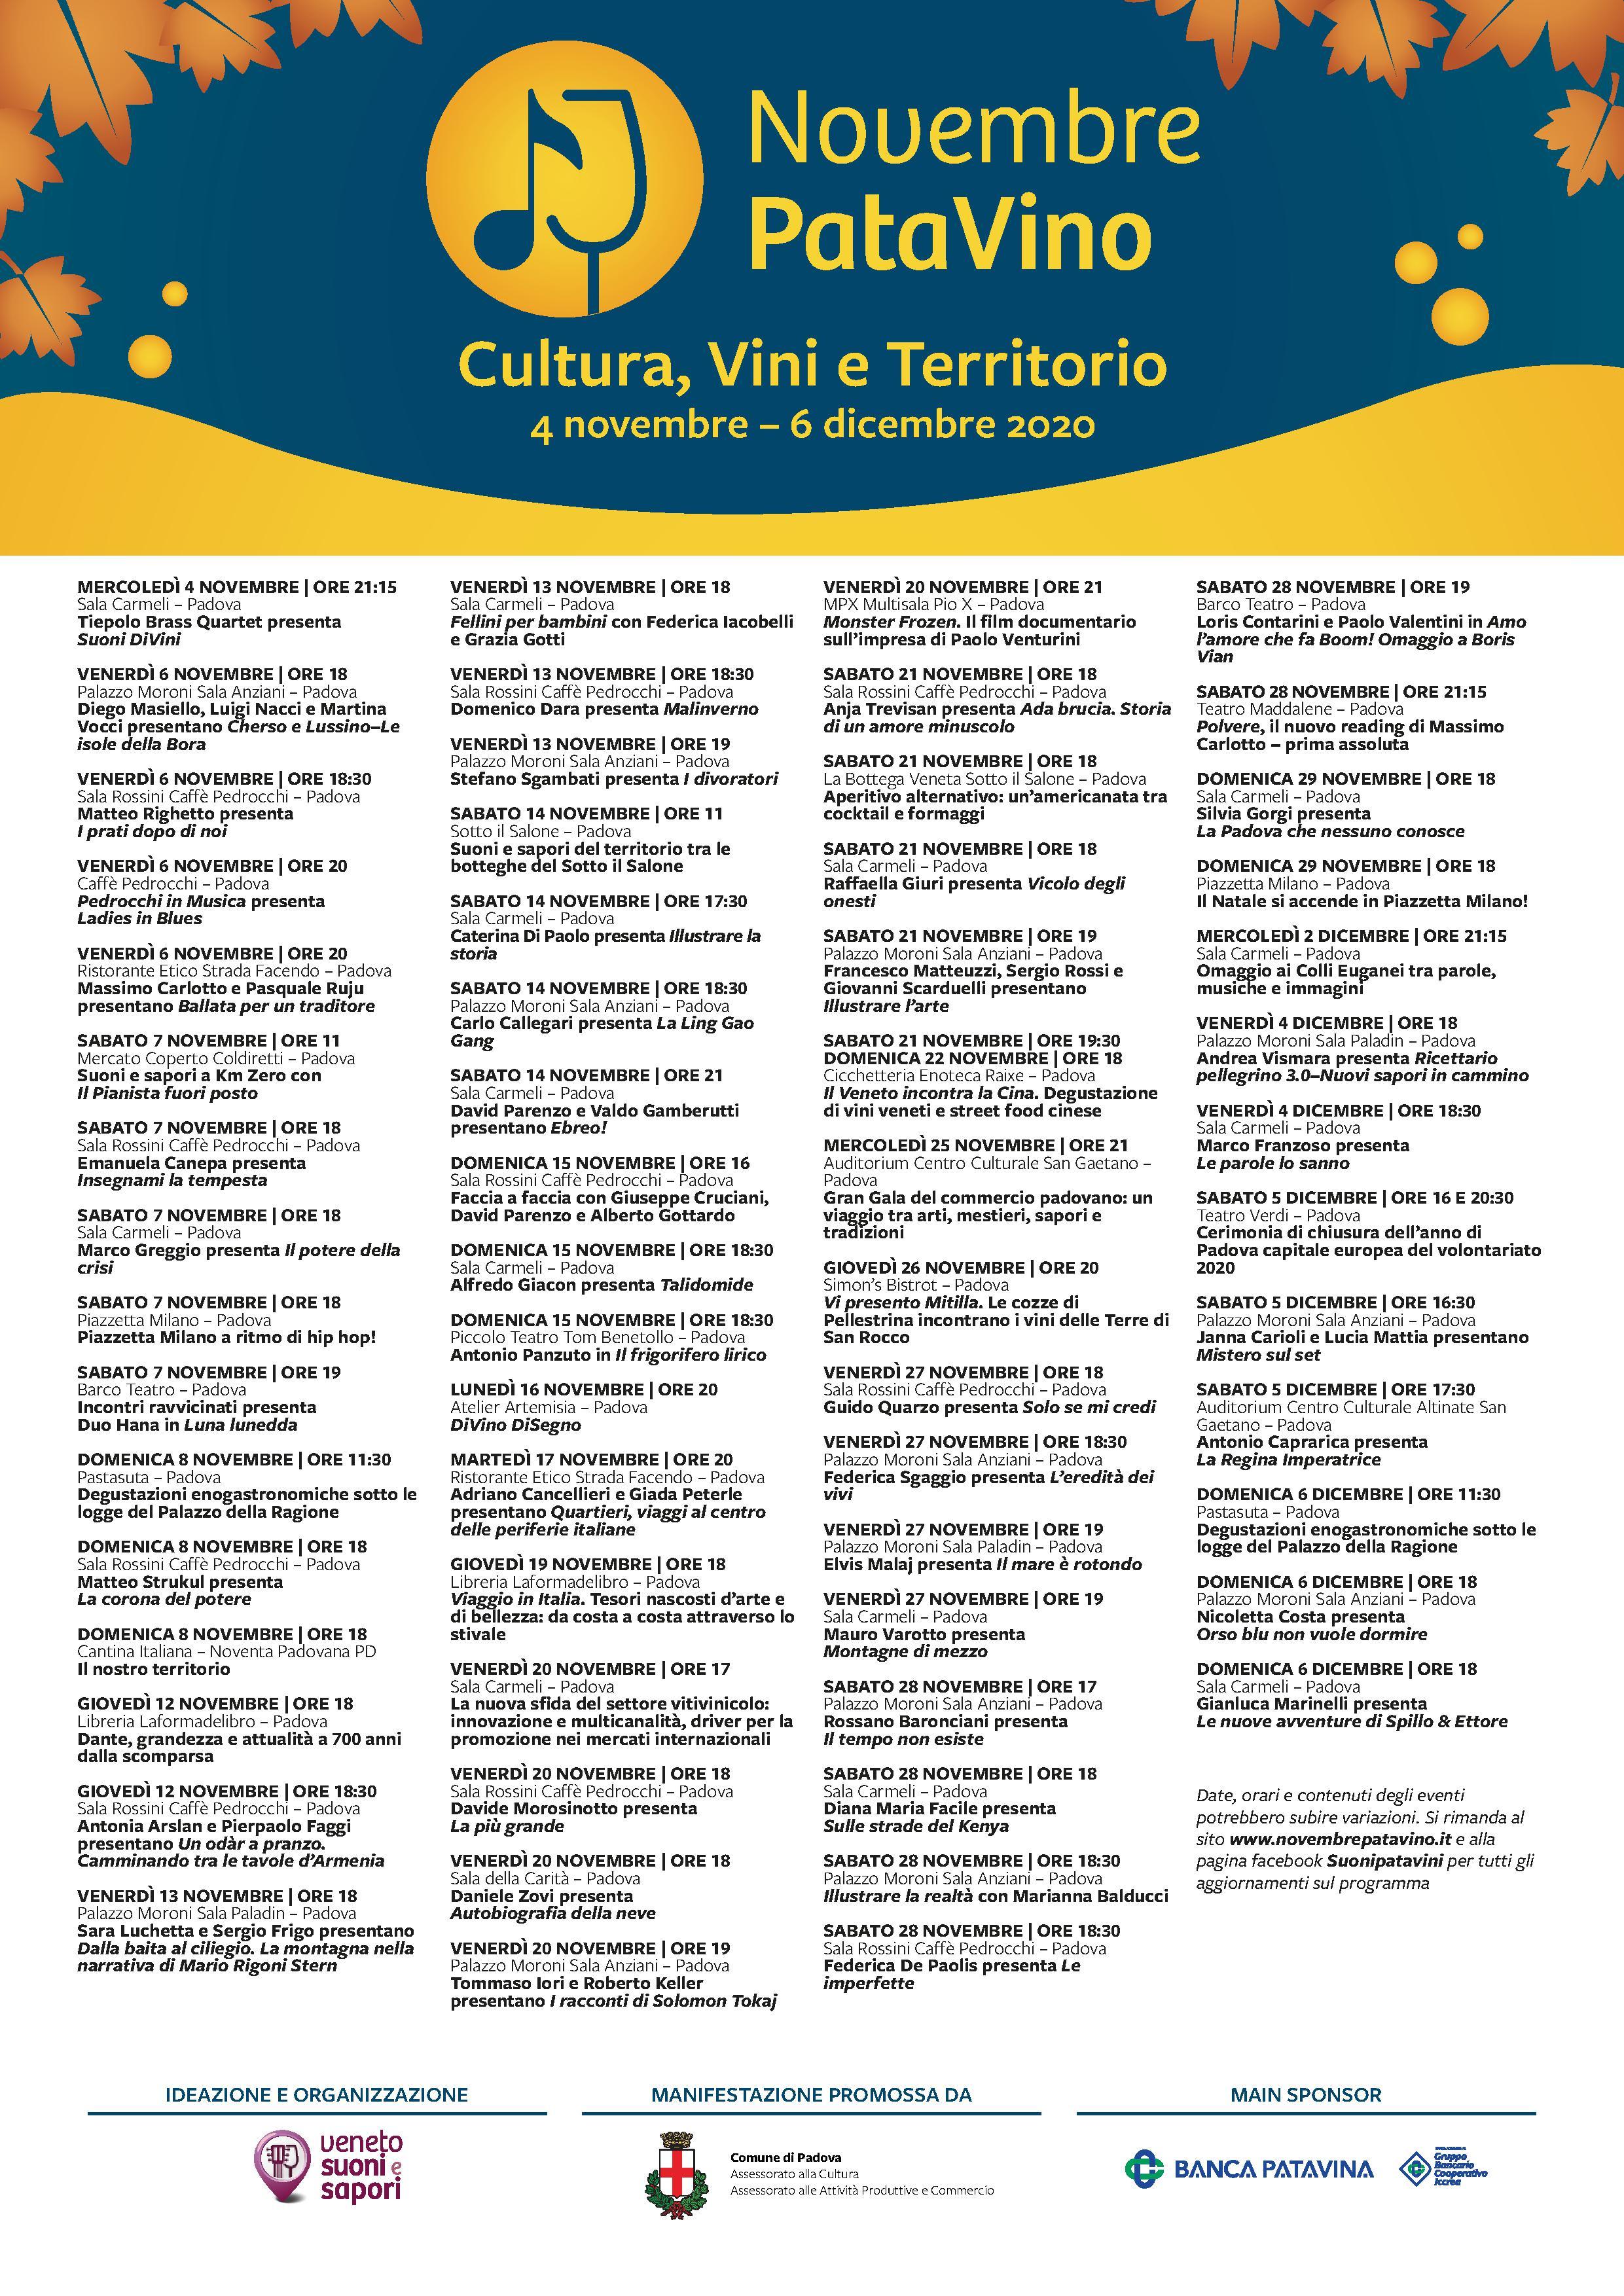 Novembre PataVino programma